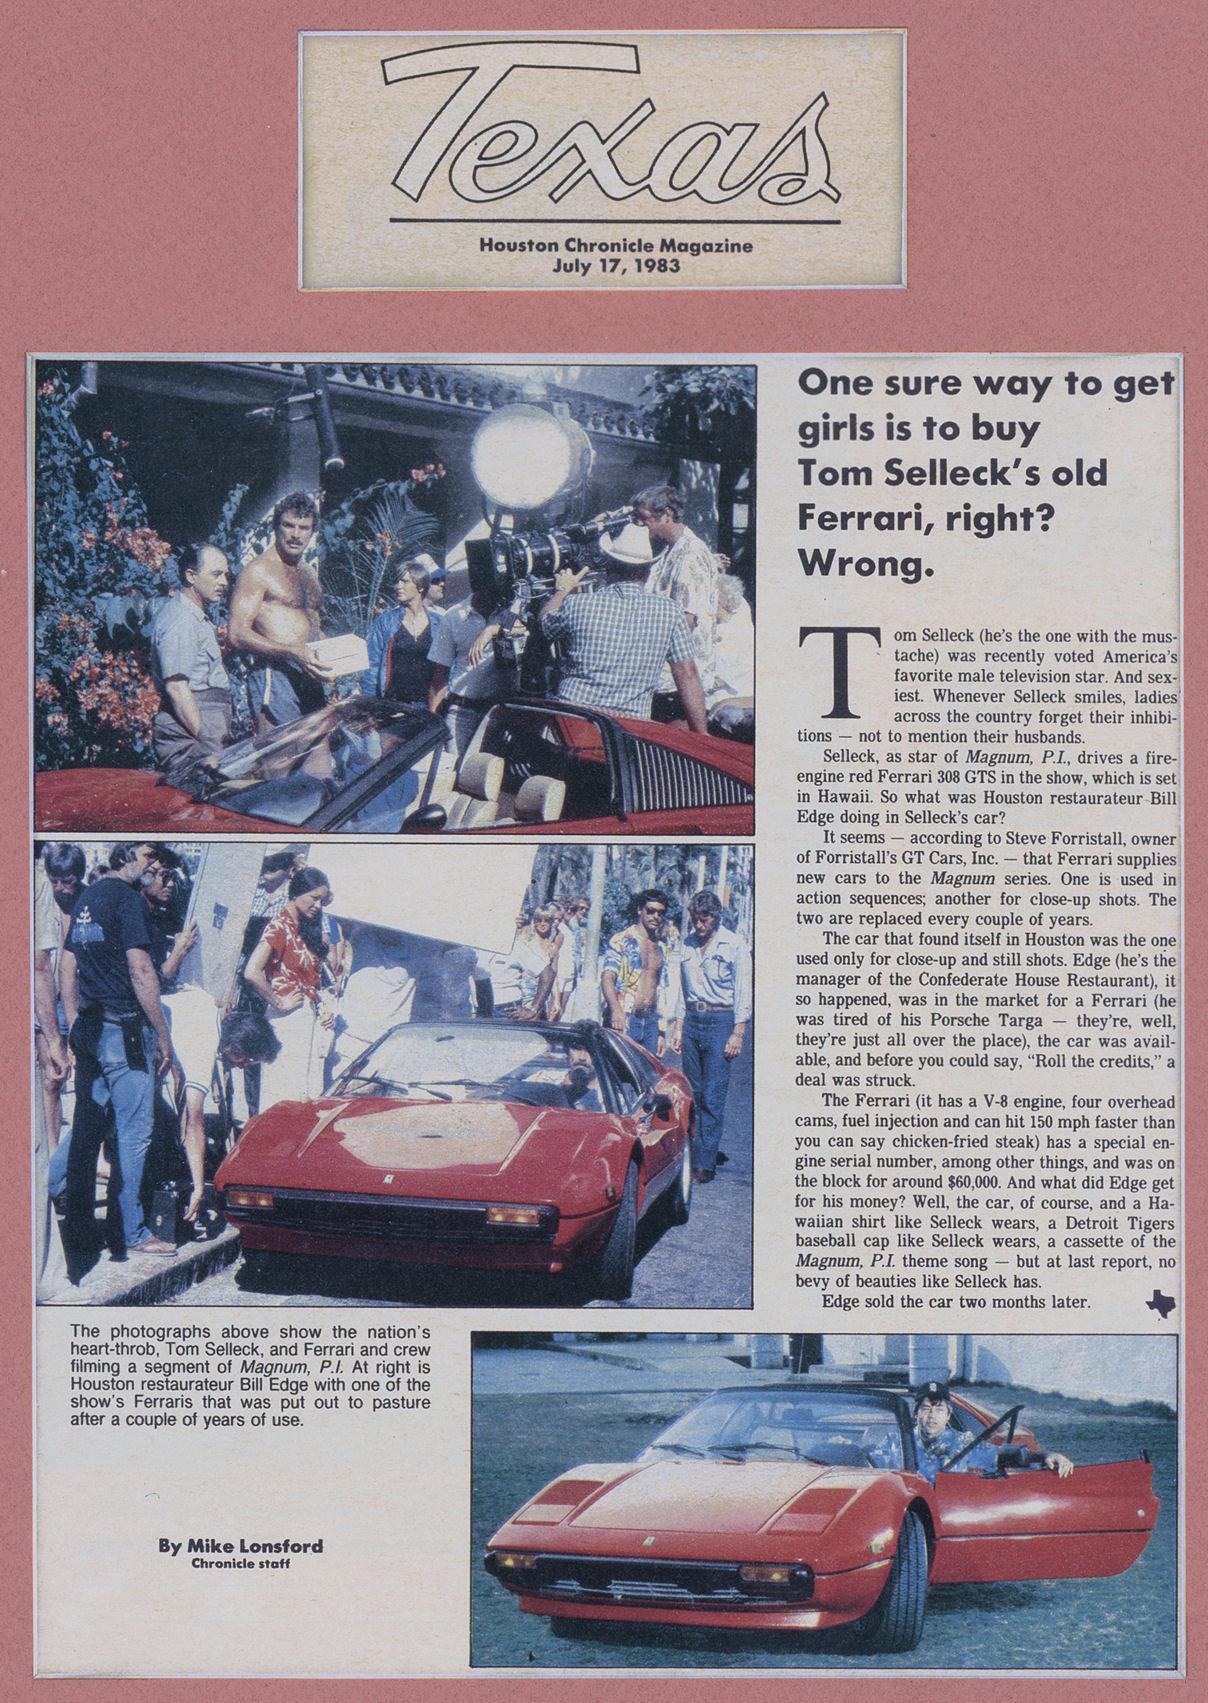 Tom Sellecks Ferrari